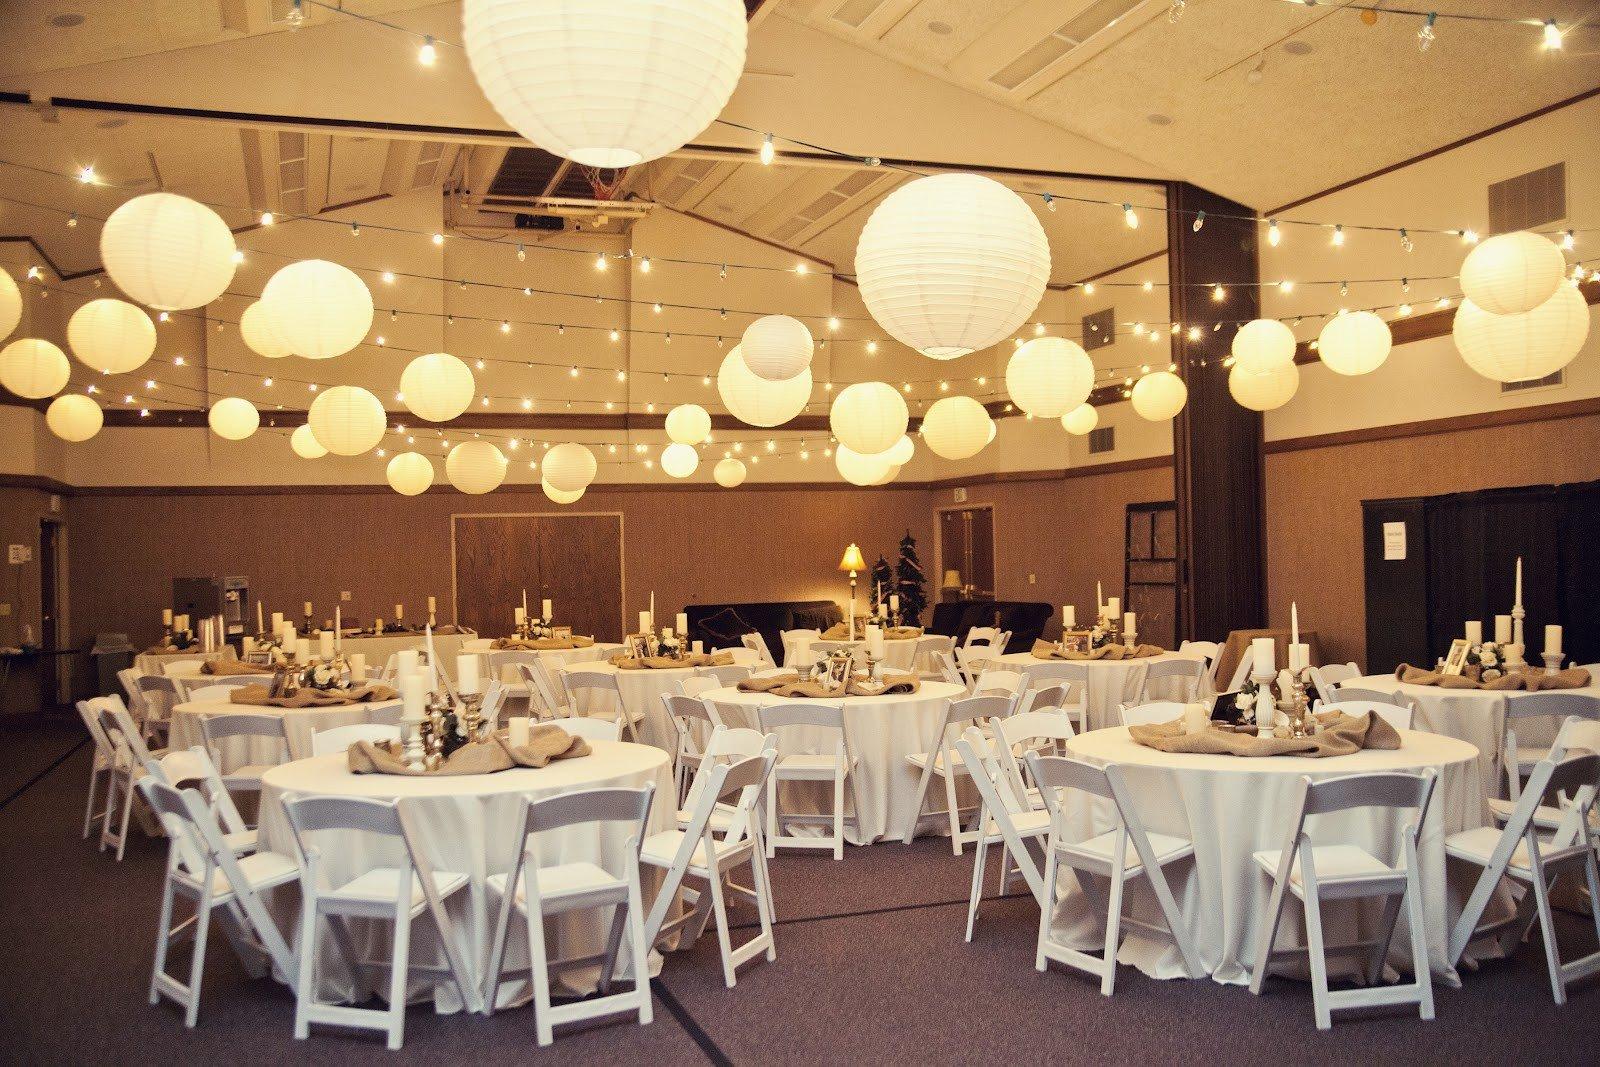 Decor Ideas for Wedding Reception Inspirational Beehive Art Salon Wedding